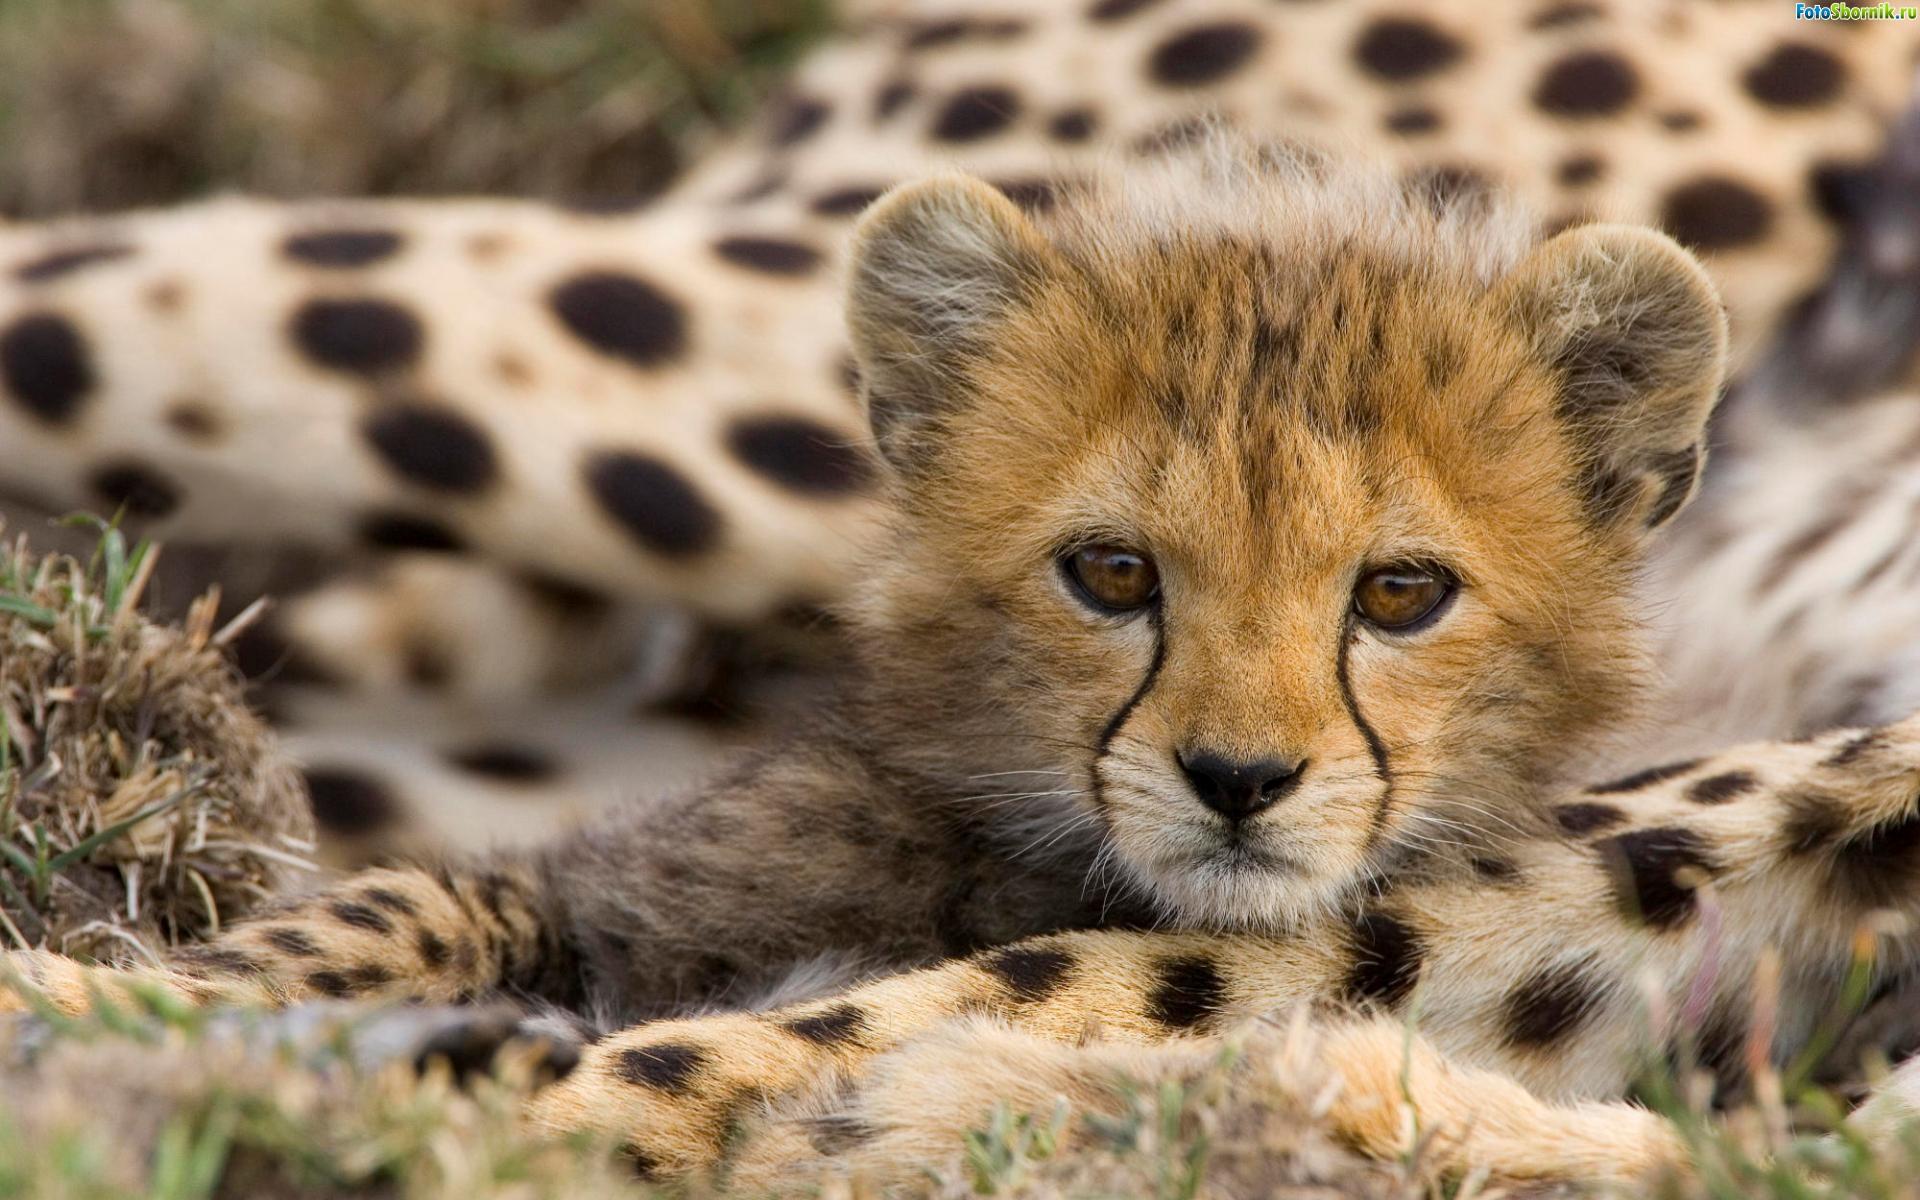 фото котята леопарда